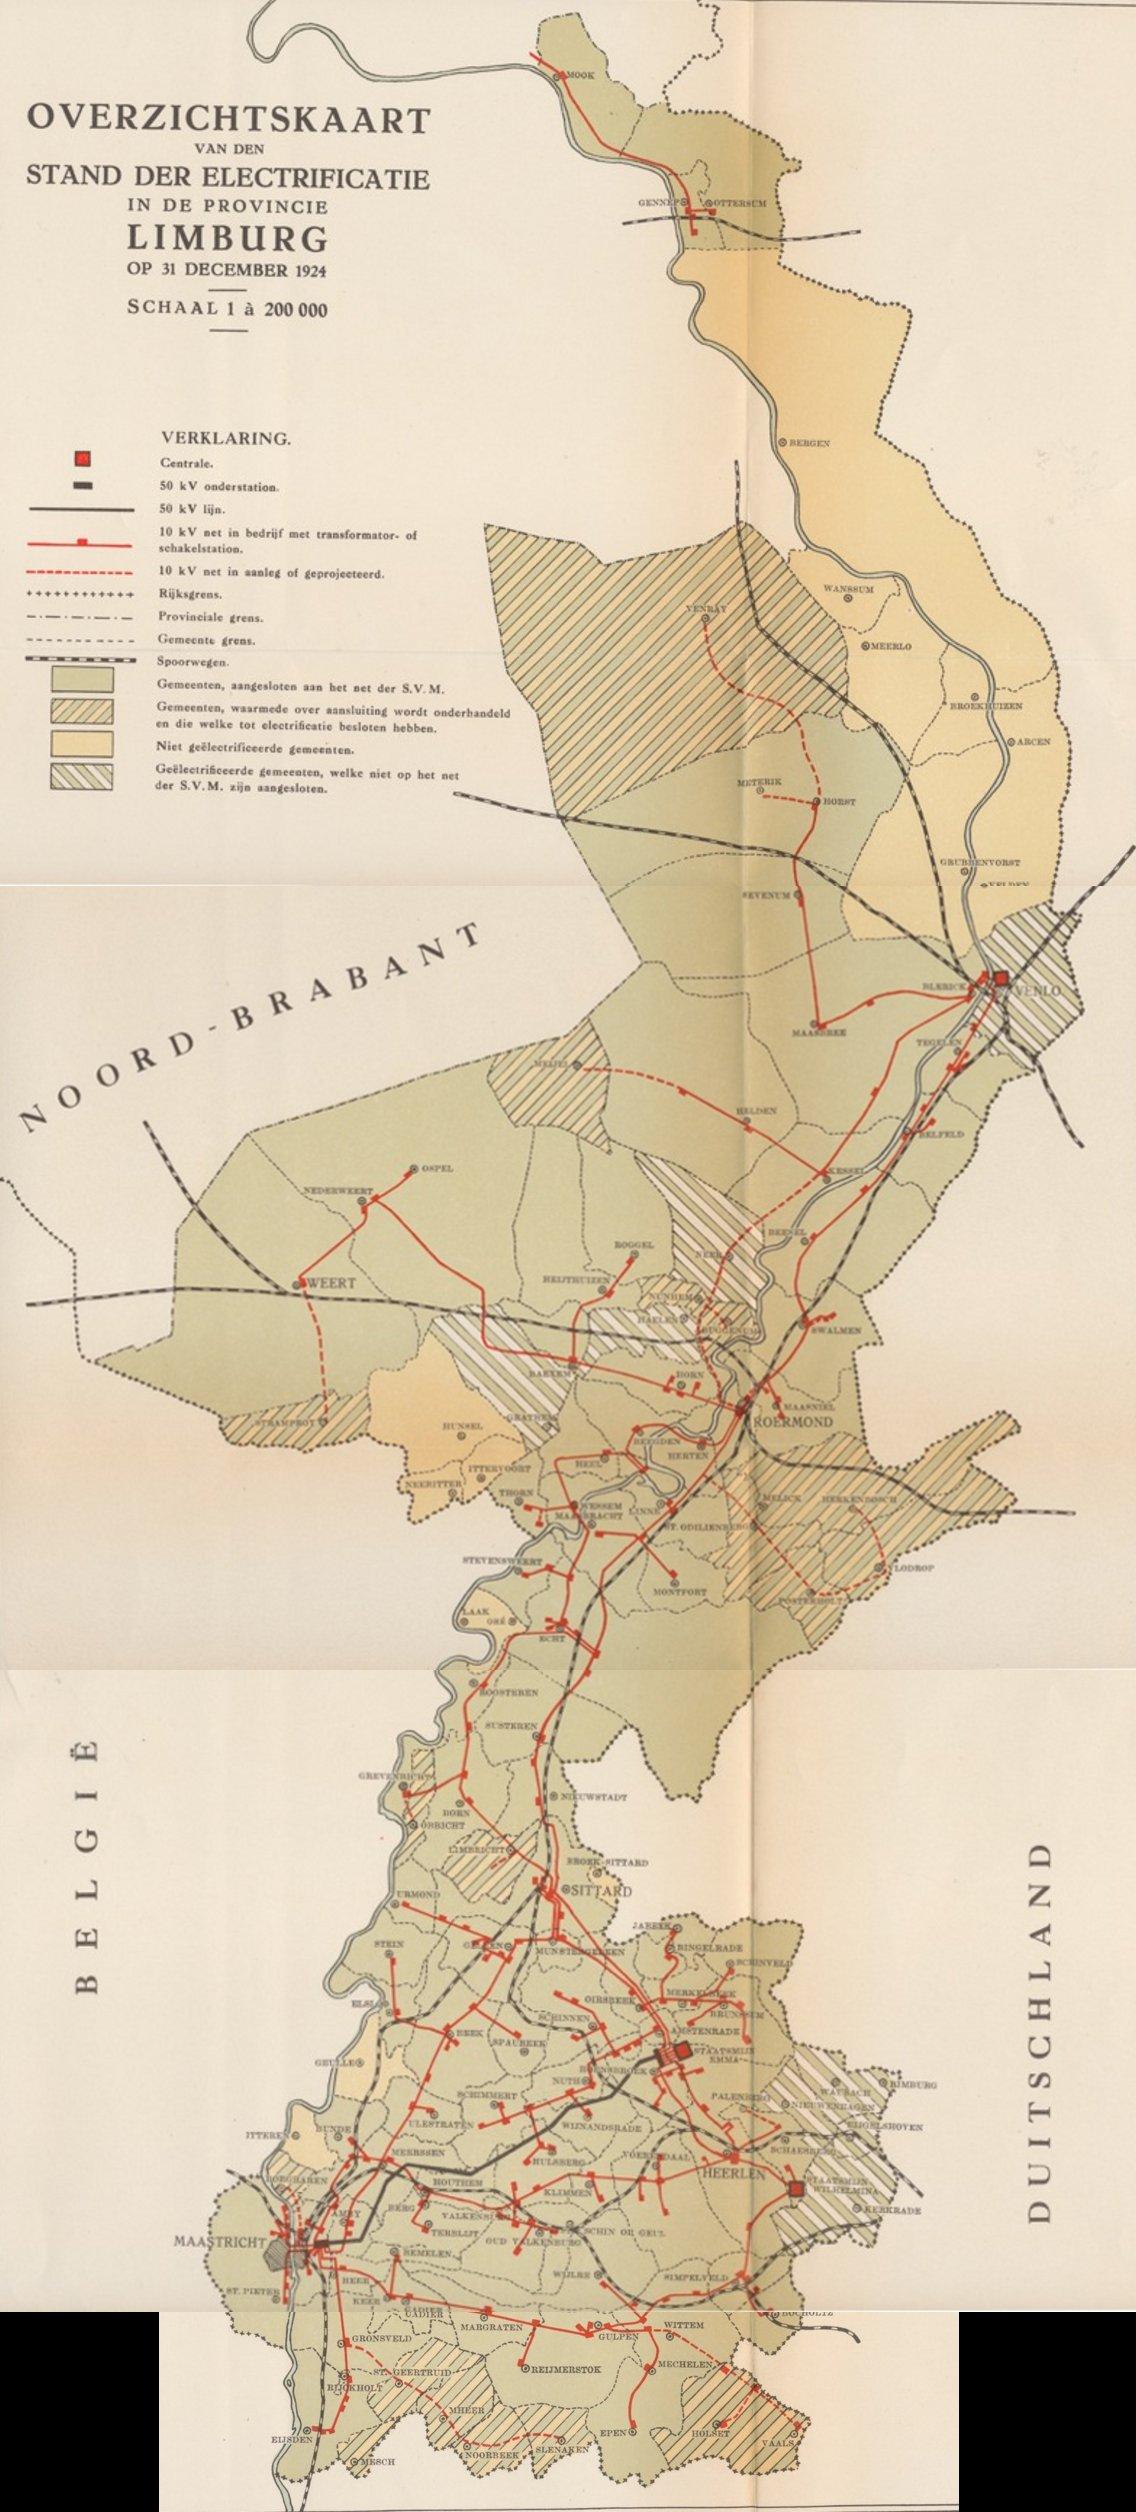 Netkaart Limburg 1924